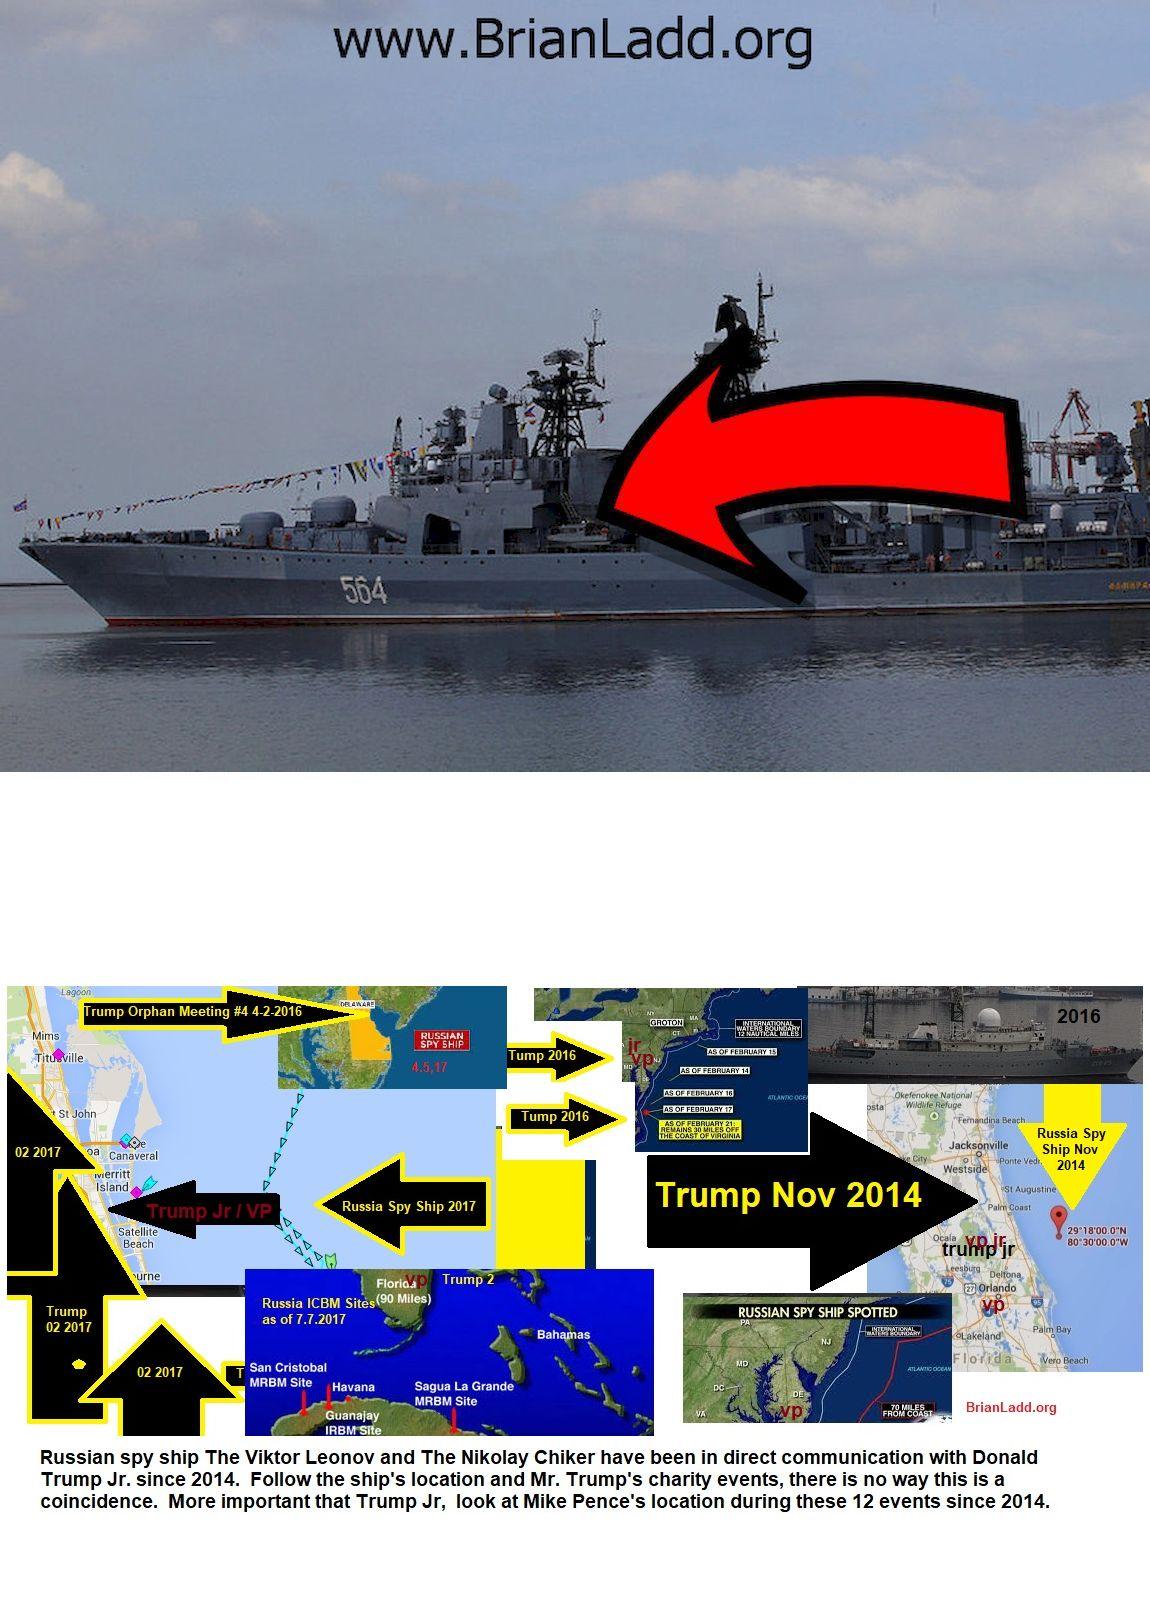 images_q=tbn_ANd227GcRplFHLOQUzNZmJsm4RdceYBgT43fYYVP4Nu5t7_WEF9PaPUVbcVA_russian_spy_ship_cnn_Don.jpg